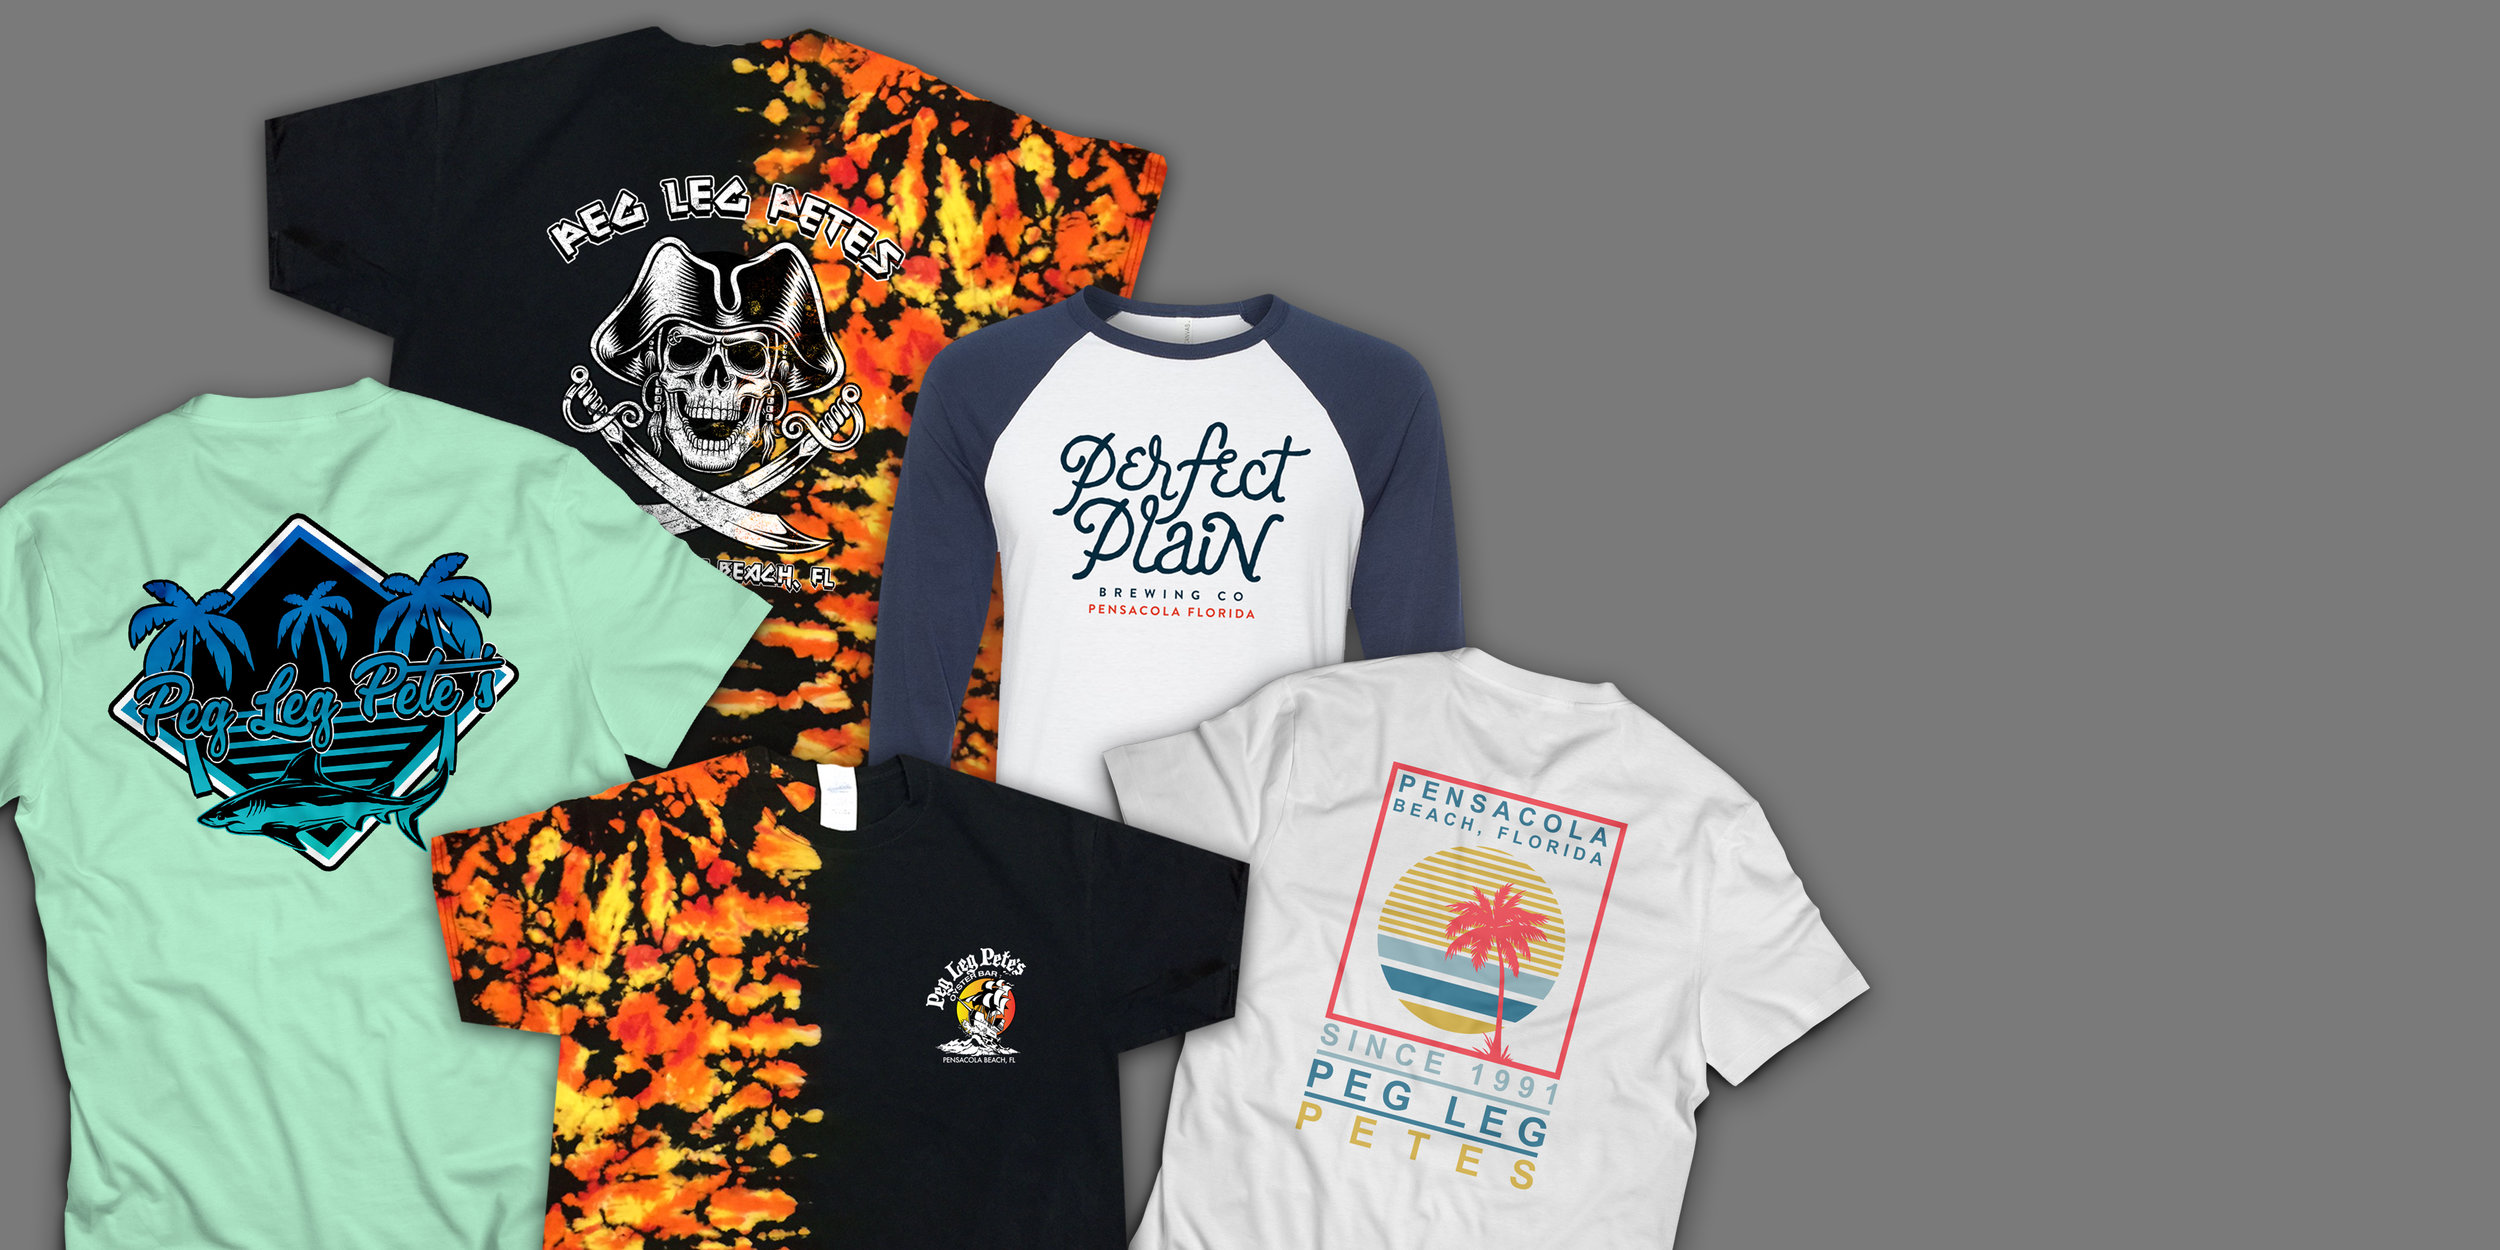 2888c243 Wholesale Printed T Shirts Florida - DREAMWORKS